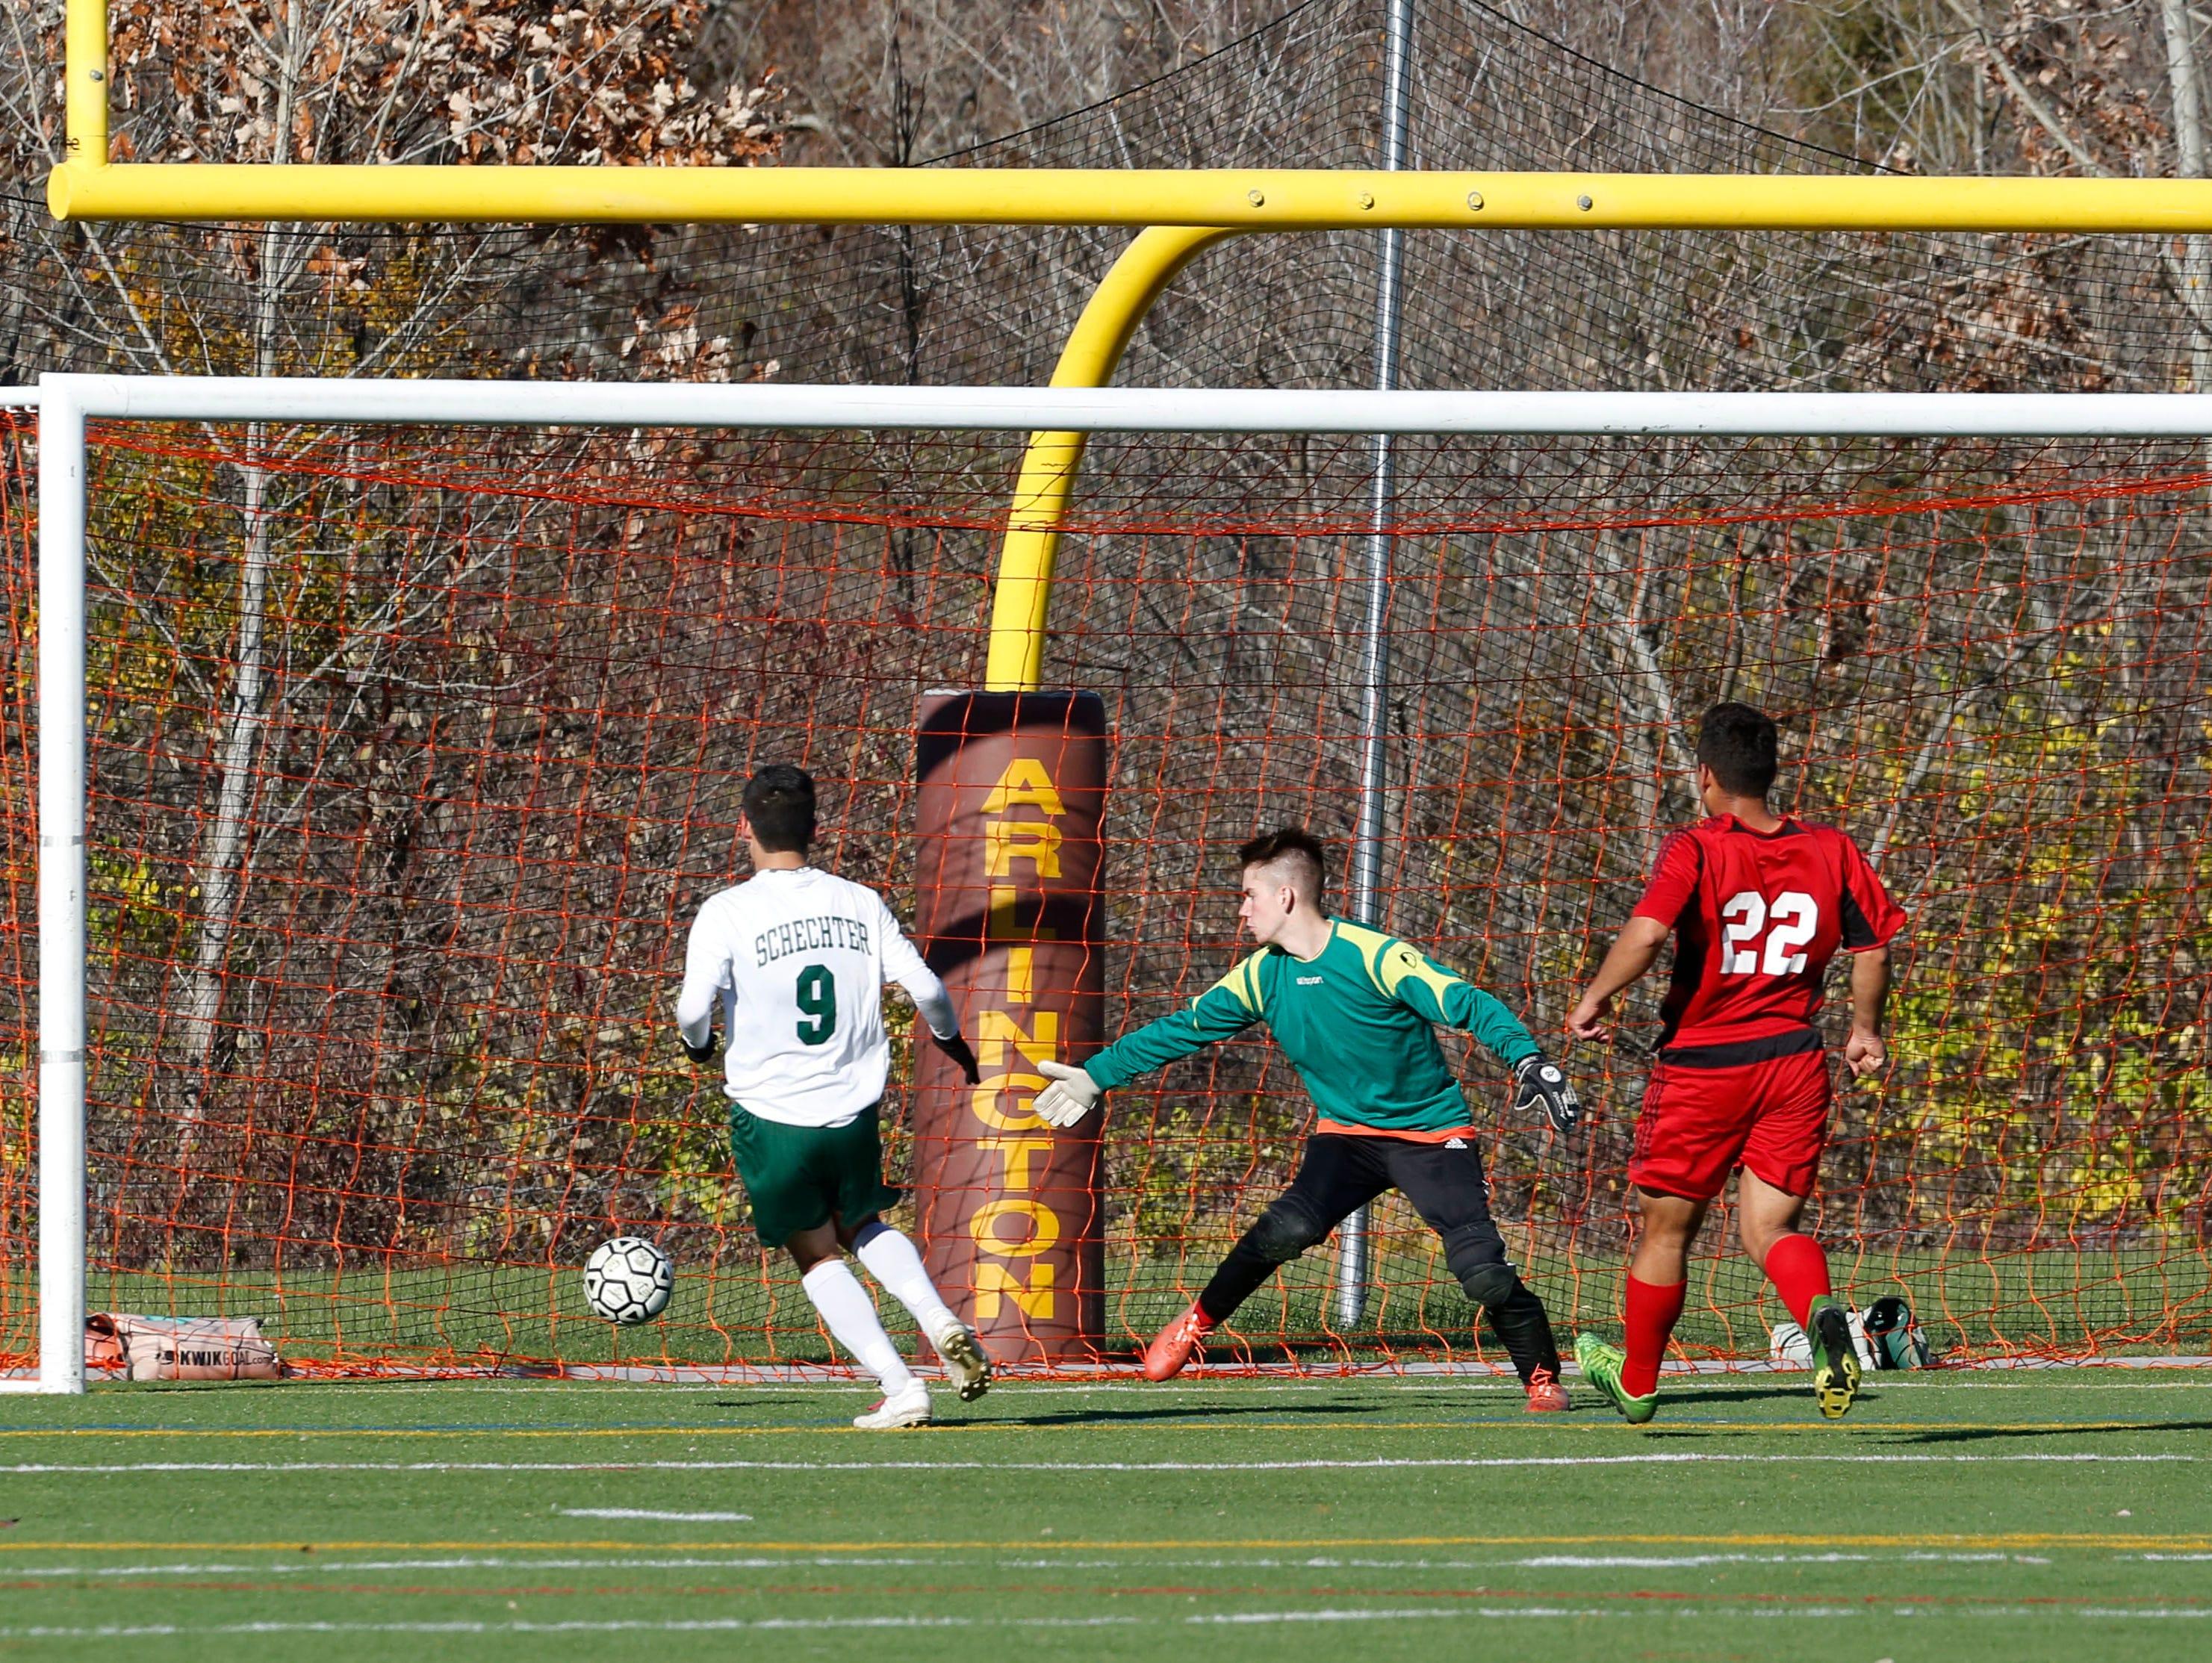 Solomon Schechter's Miles Ogihara scores the winning goal against Hamilton's Conor Brosnan in the Class C boys soccer final Oct. 30, 2015 at Arlington High School in Lagrangeville. Solomon Schechter won, 2-1, in overtime.